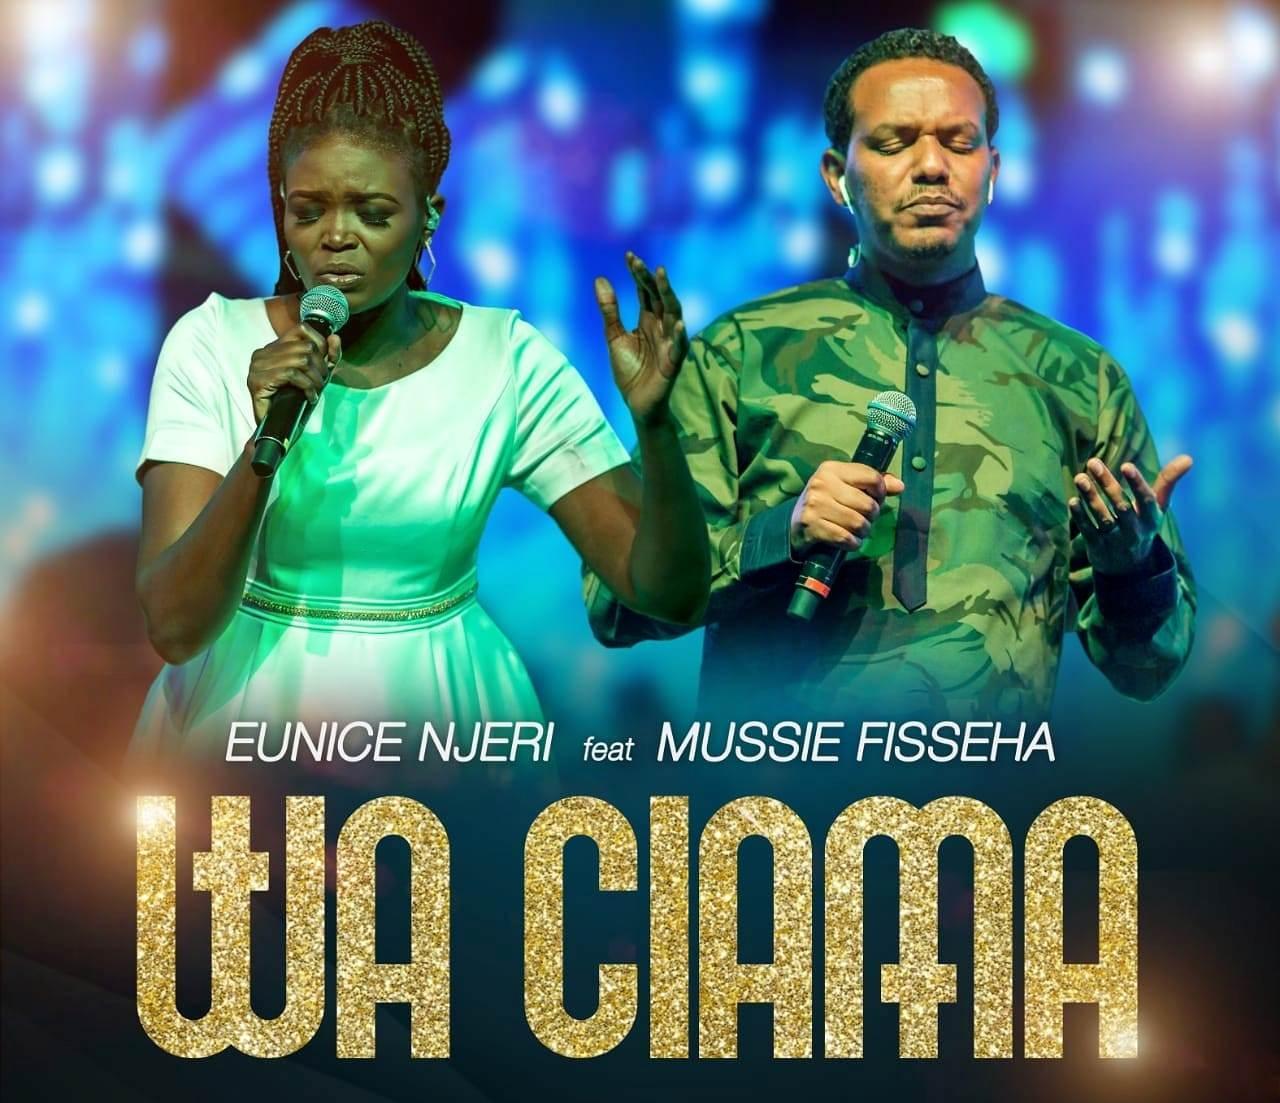 Eunice Njeri - Waciama ft. Mussie Fisseha